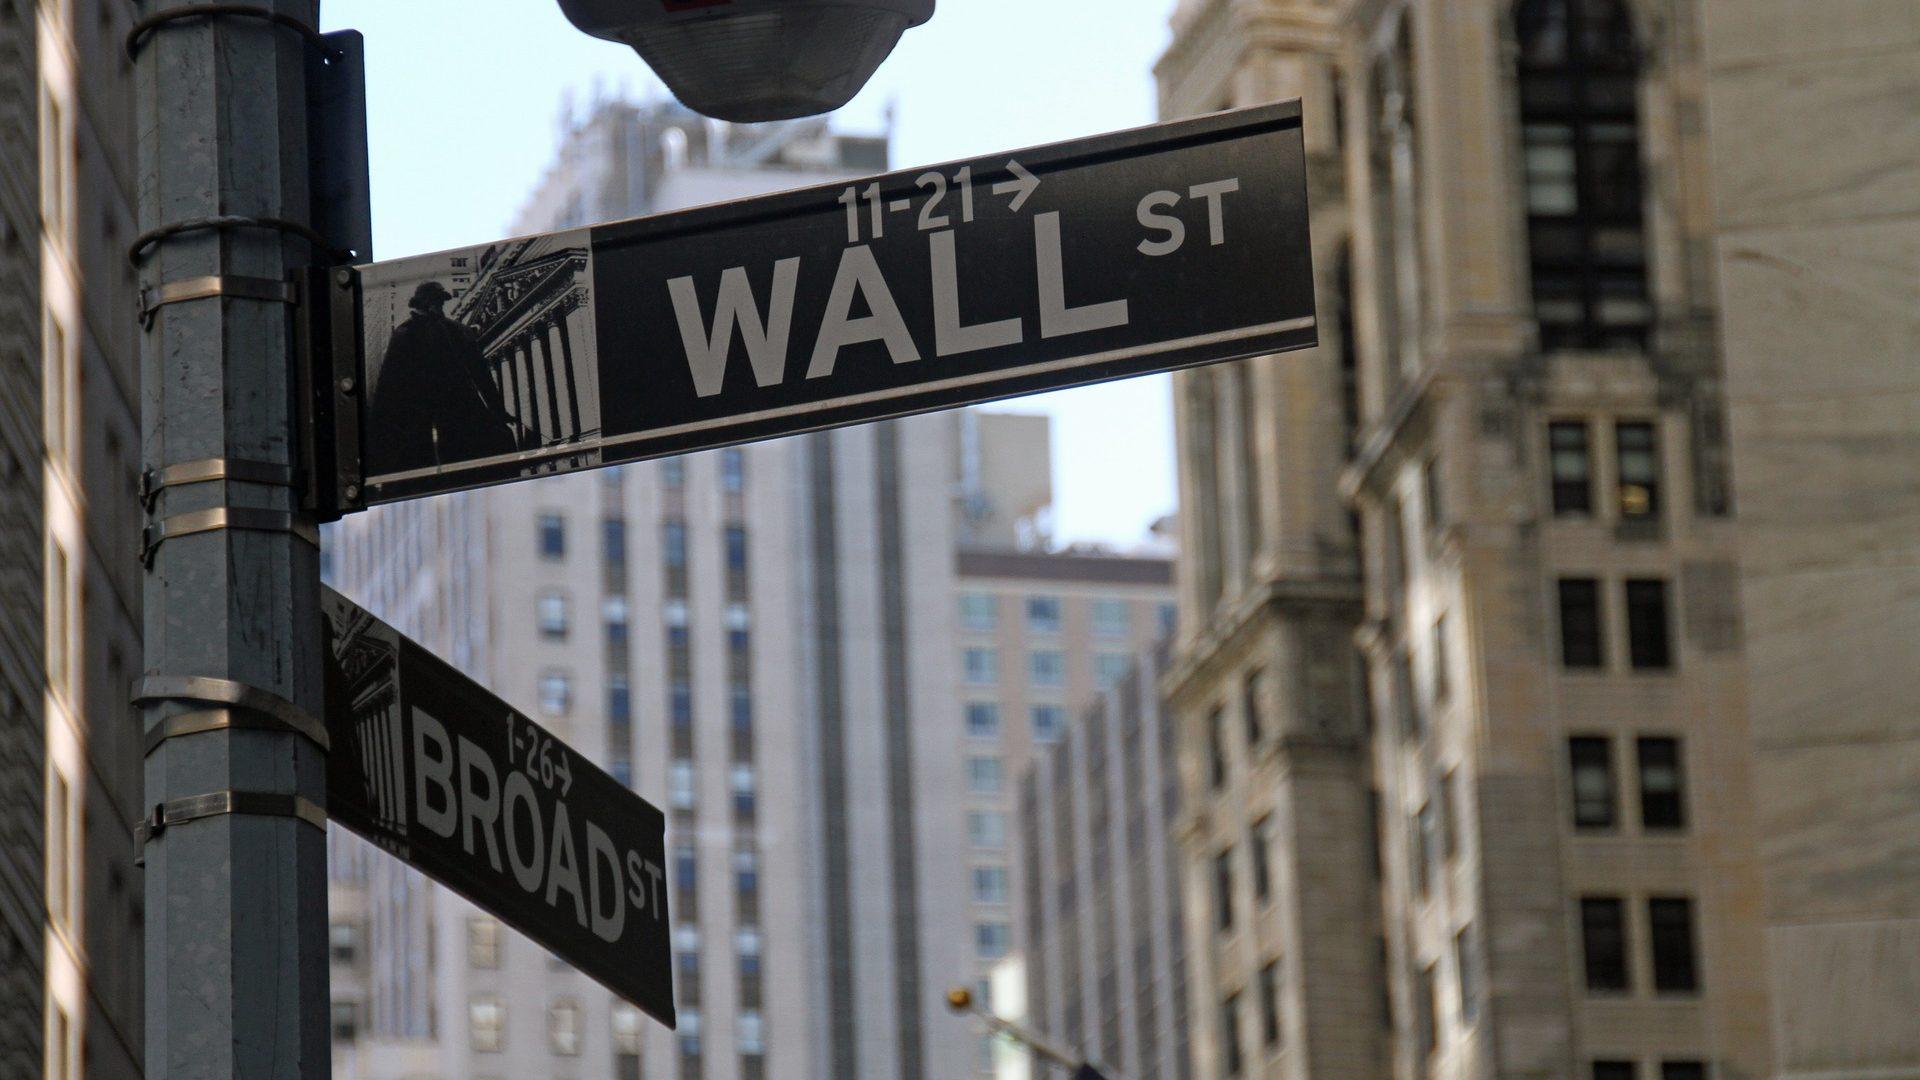 Wall Street recupera. Dow Jones continua sob pressão mas Nasdaq atinge recorde